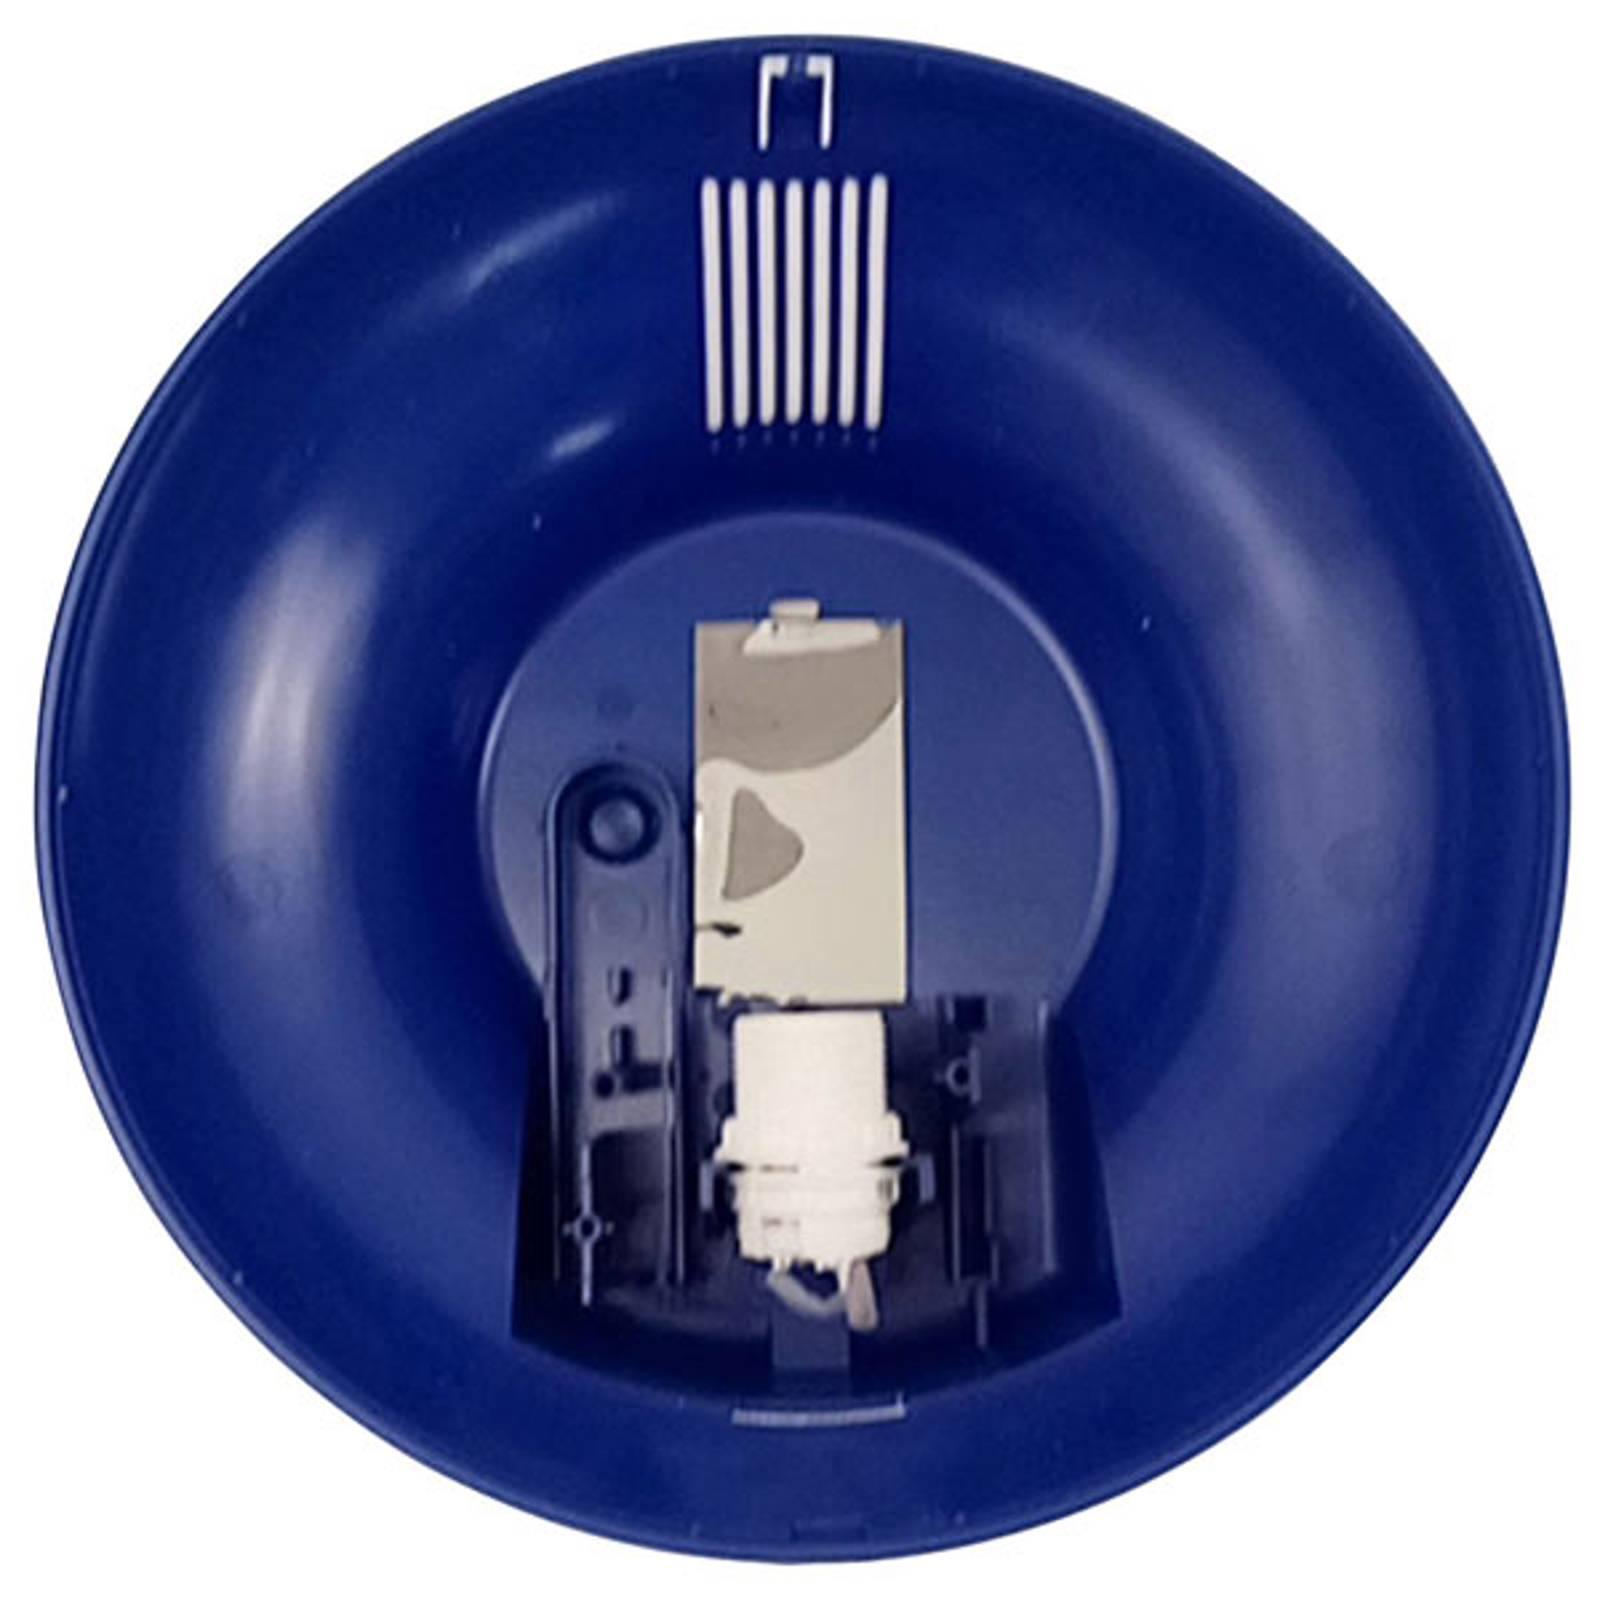 Wandlamp Paw Patrol, blauw